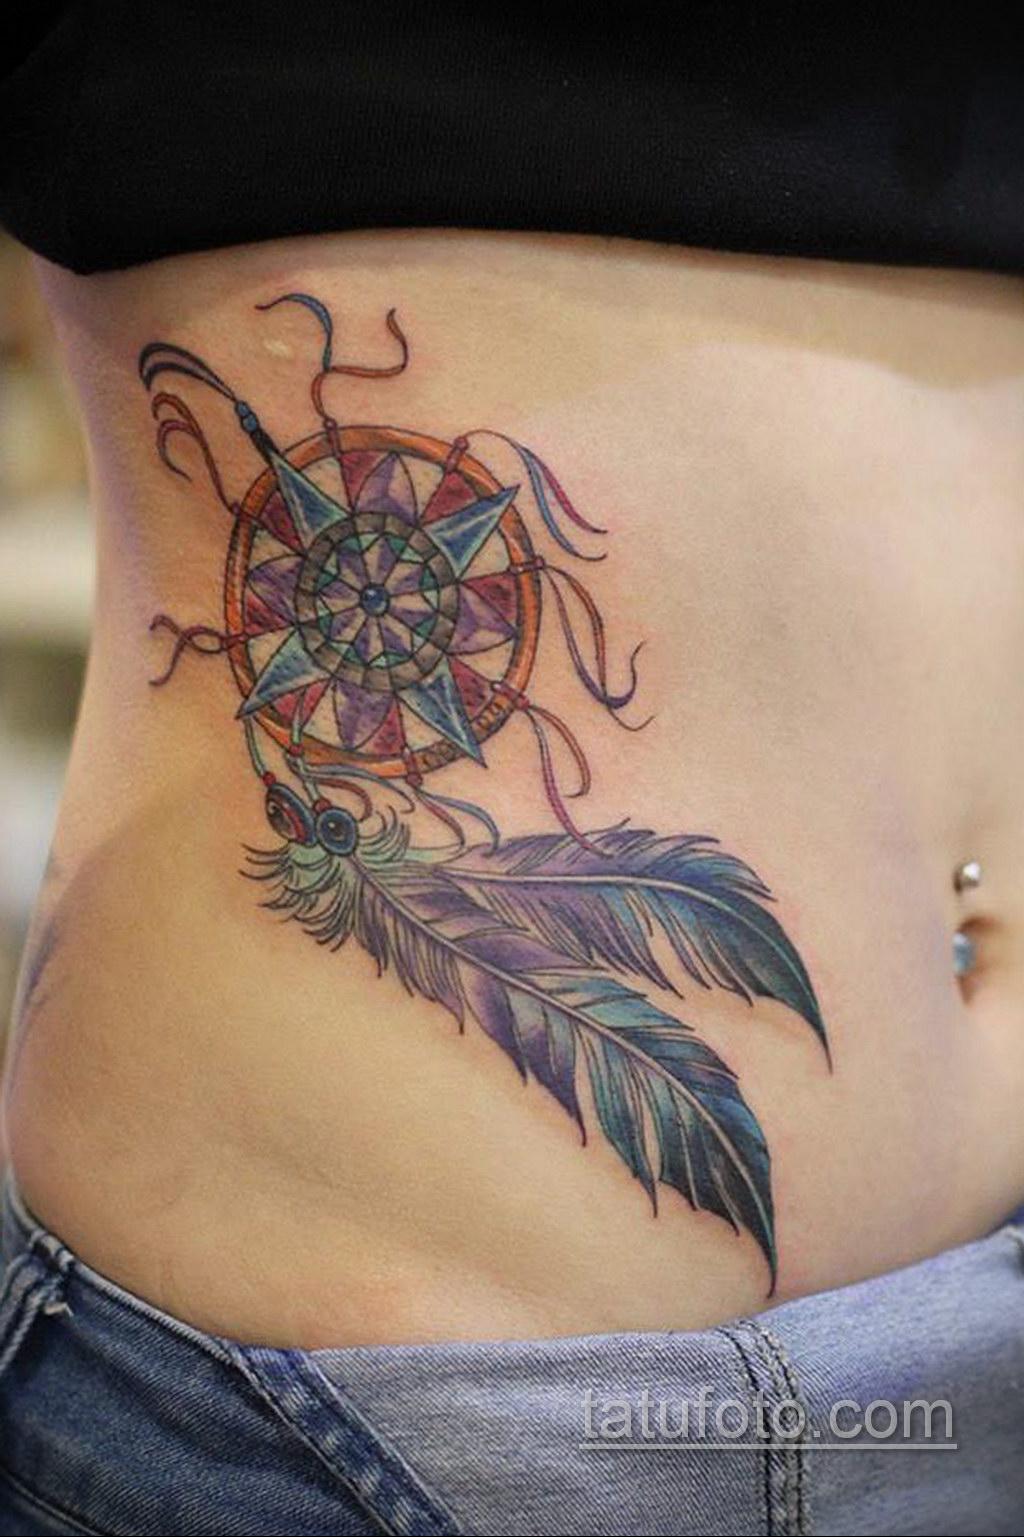 Фото рисунка тату с ловцом снов 22.11.2020 №344 -Dreamcatcher tattoo- tatufoto.com